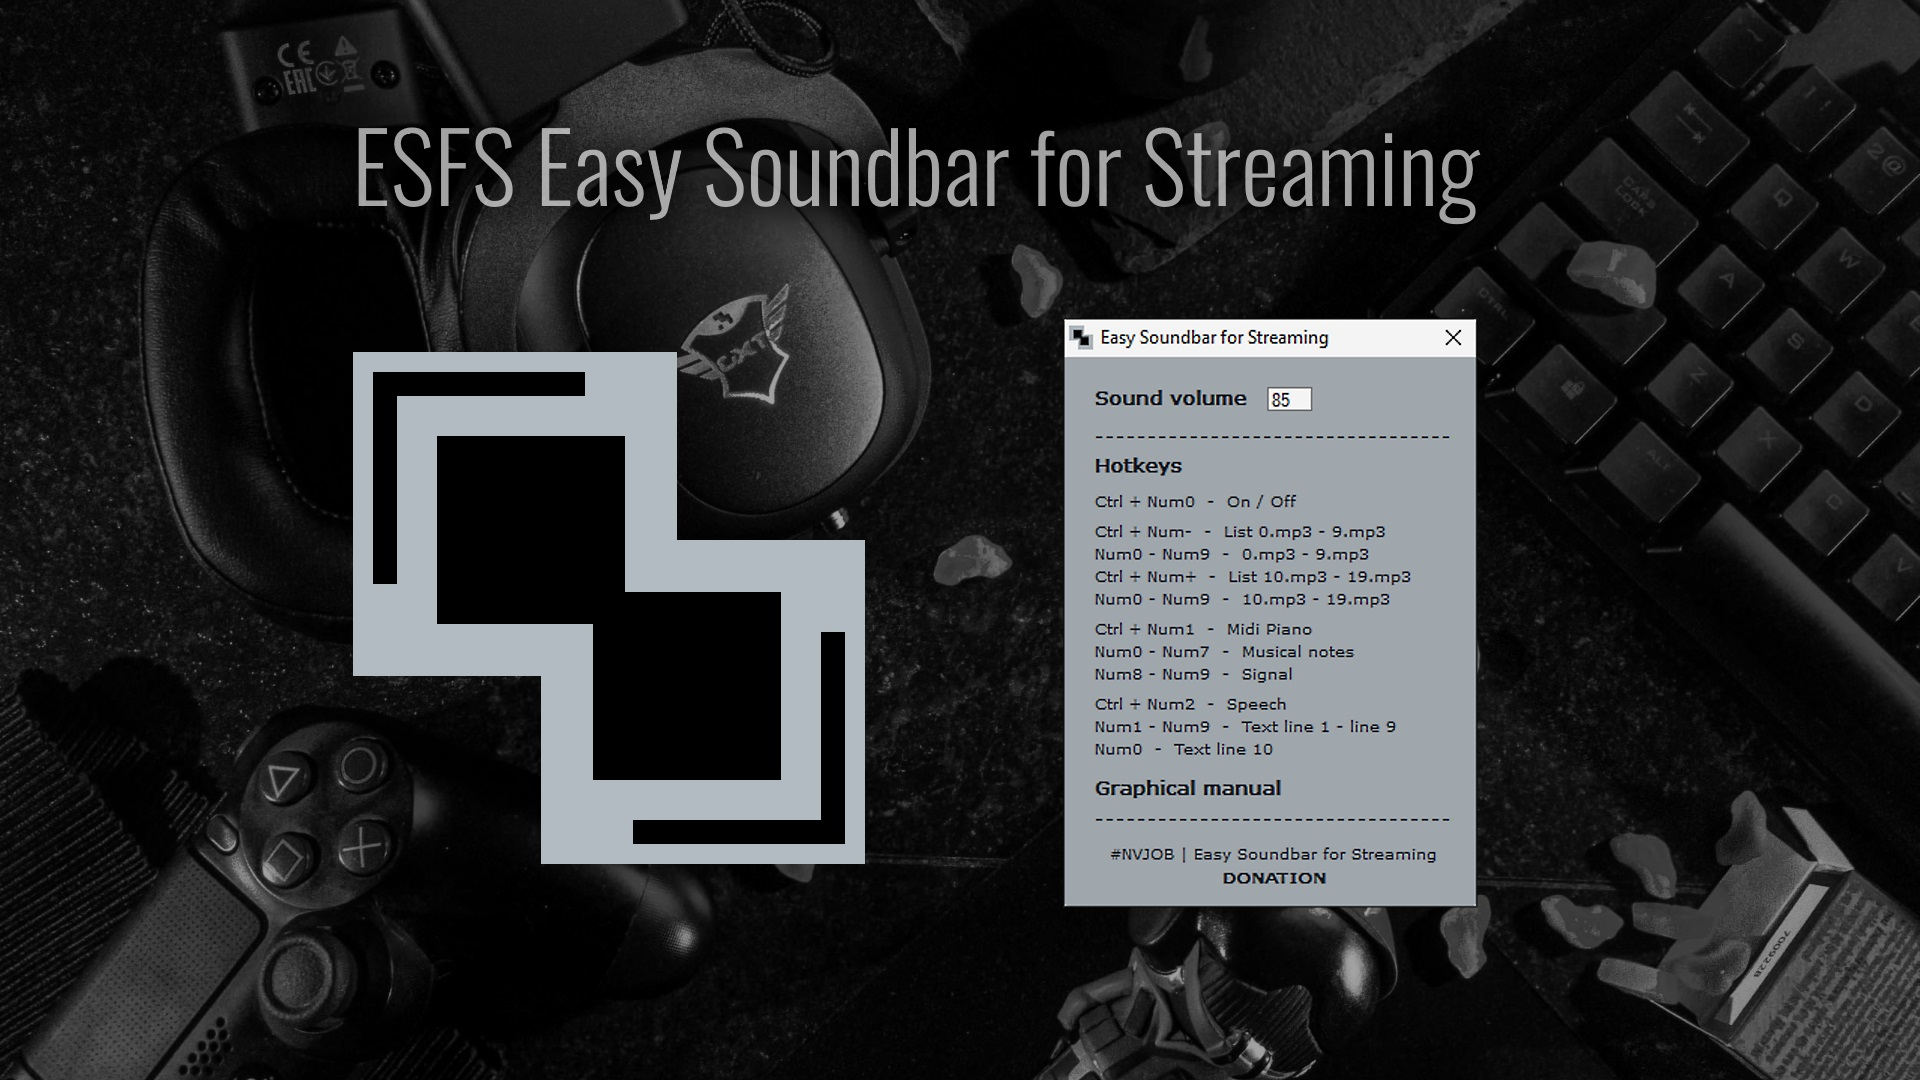 ESFS Easy Soundbar for Streaming